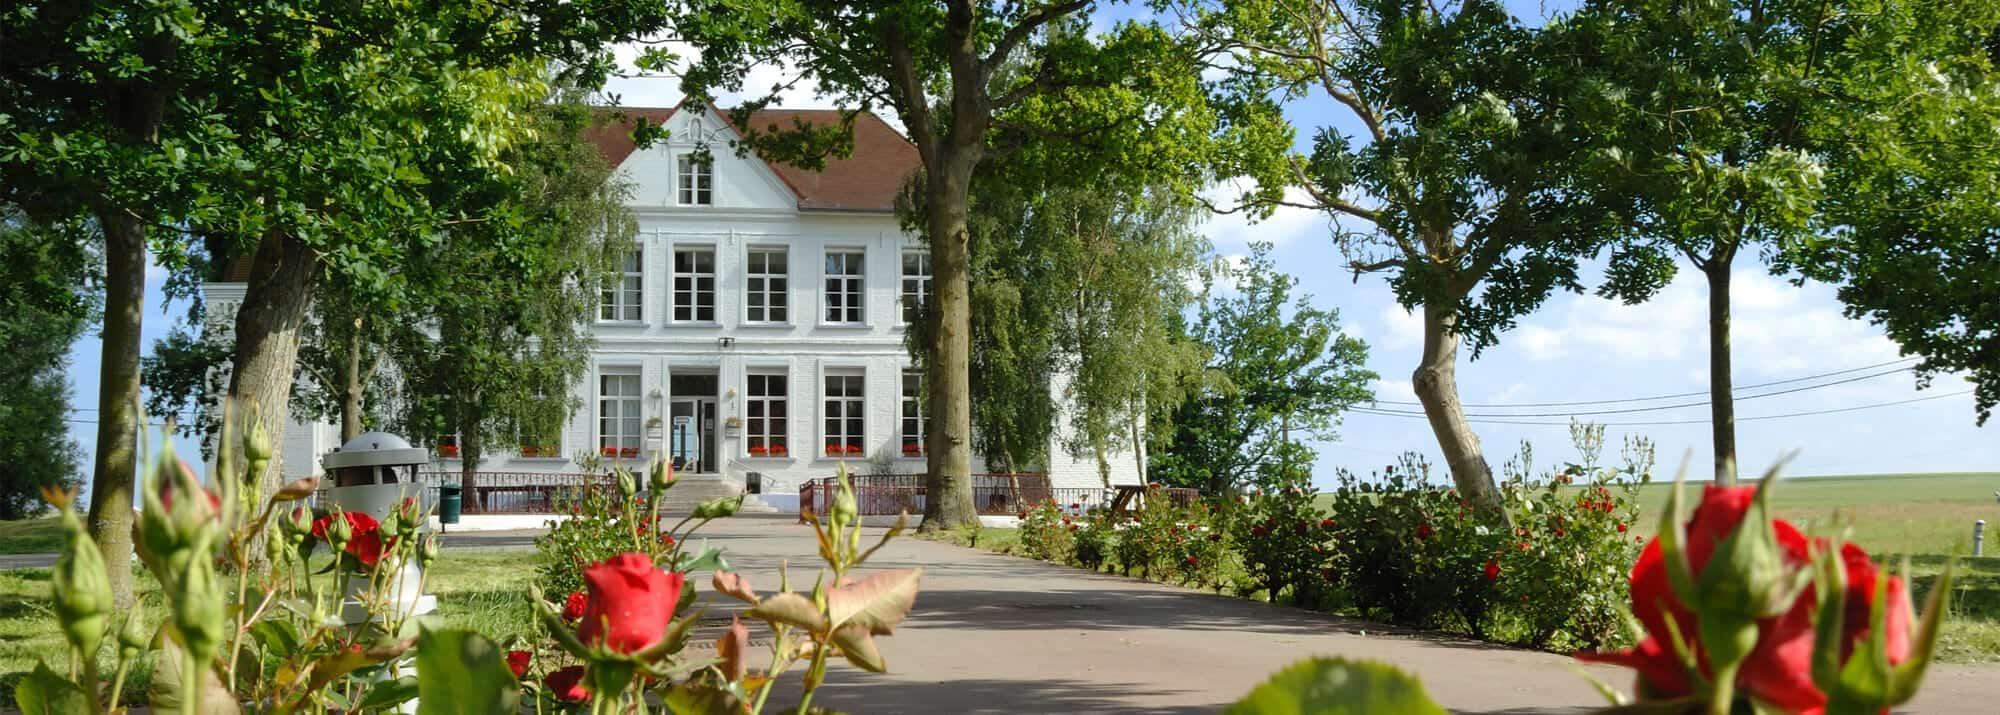 The Chateau D Ebblinghem On The Opal Coast France Nst